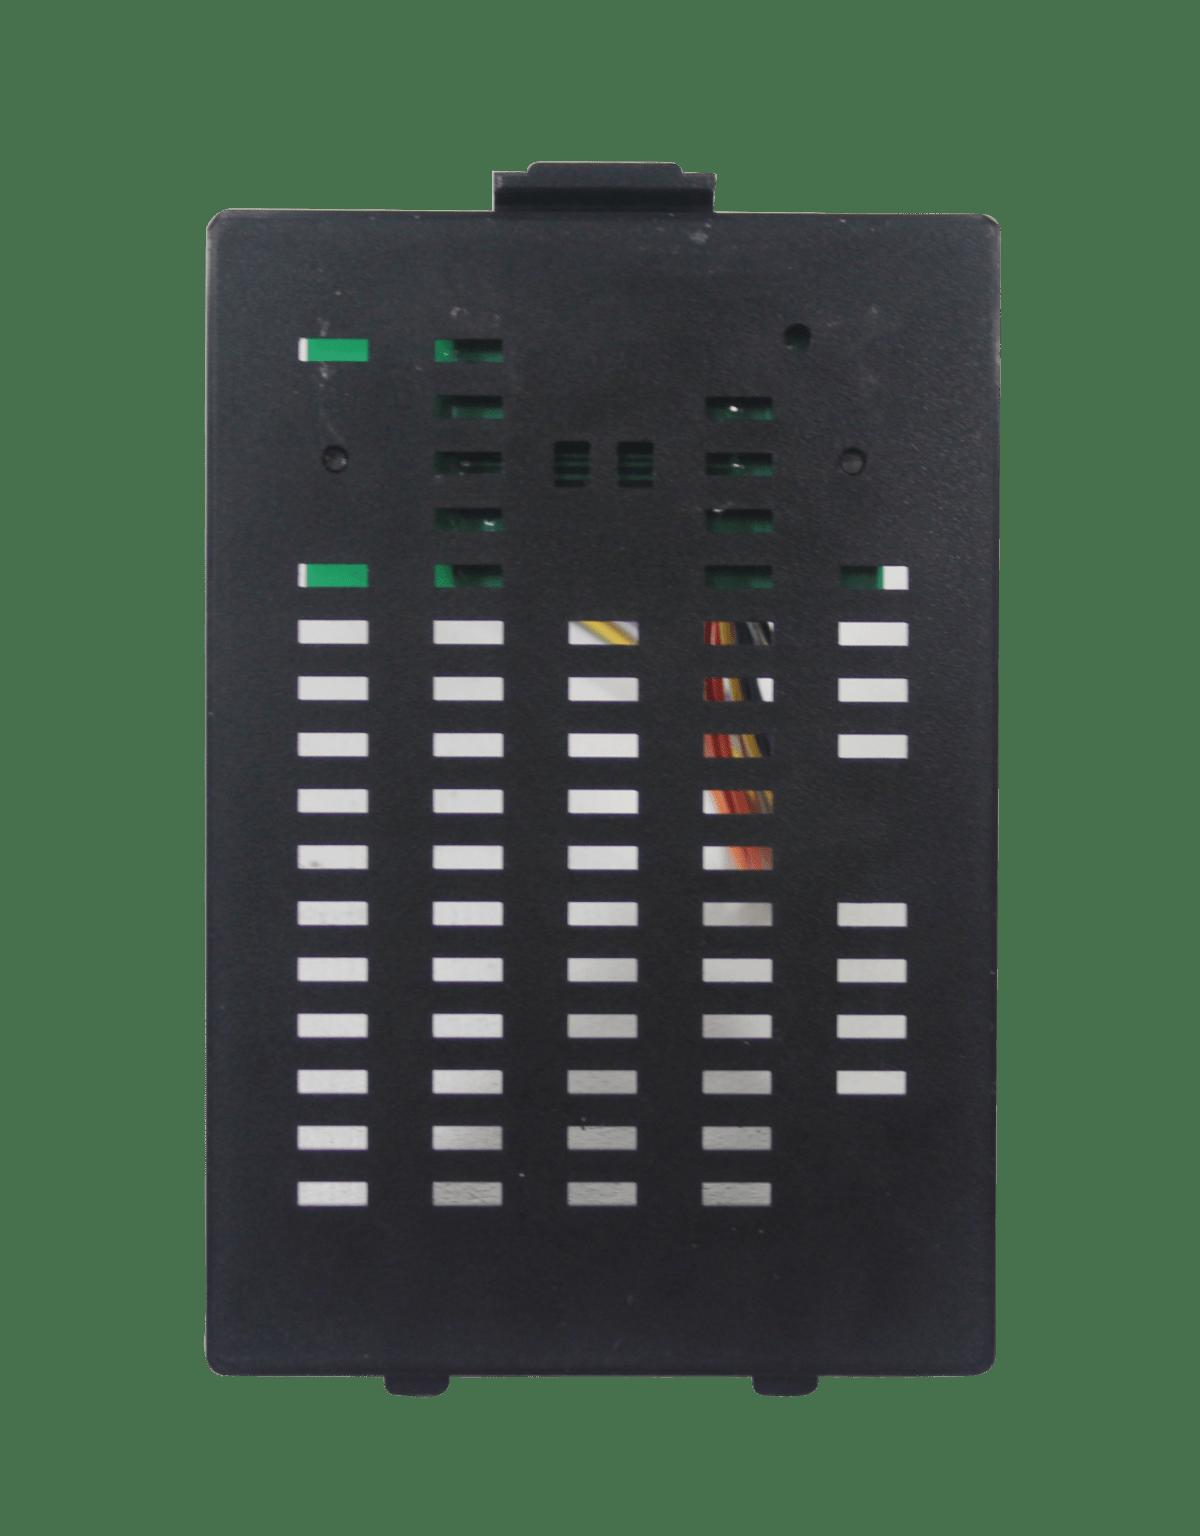 Godex wifi RT860i